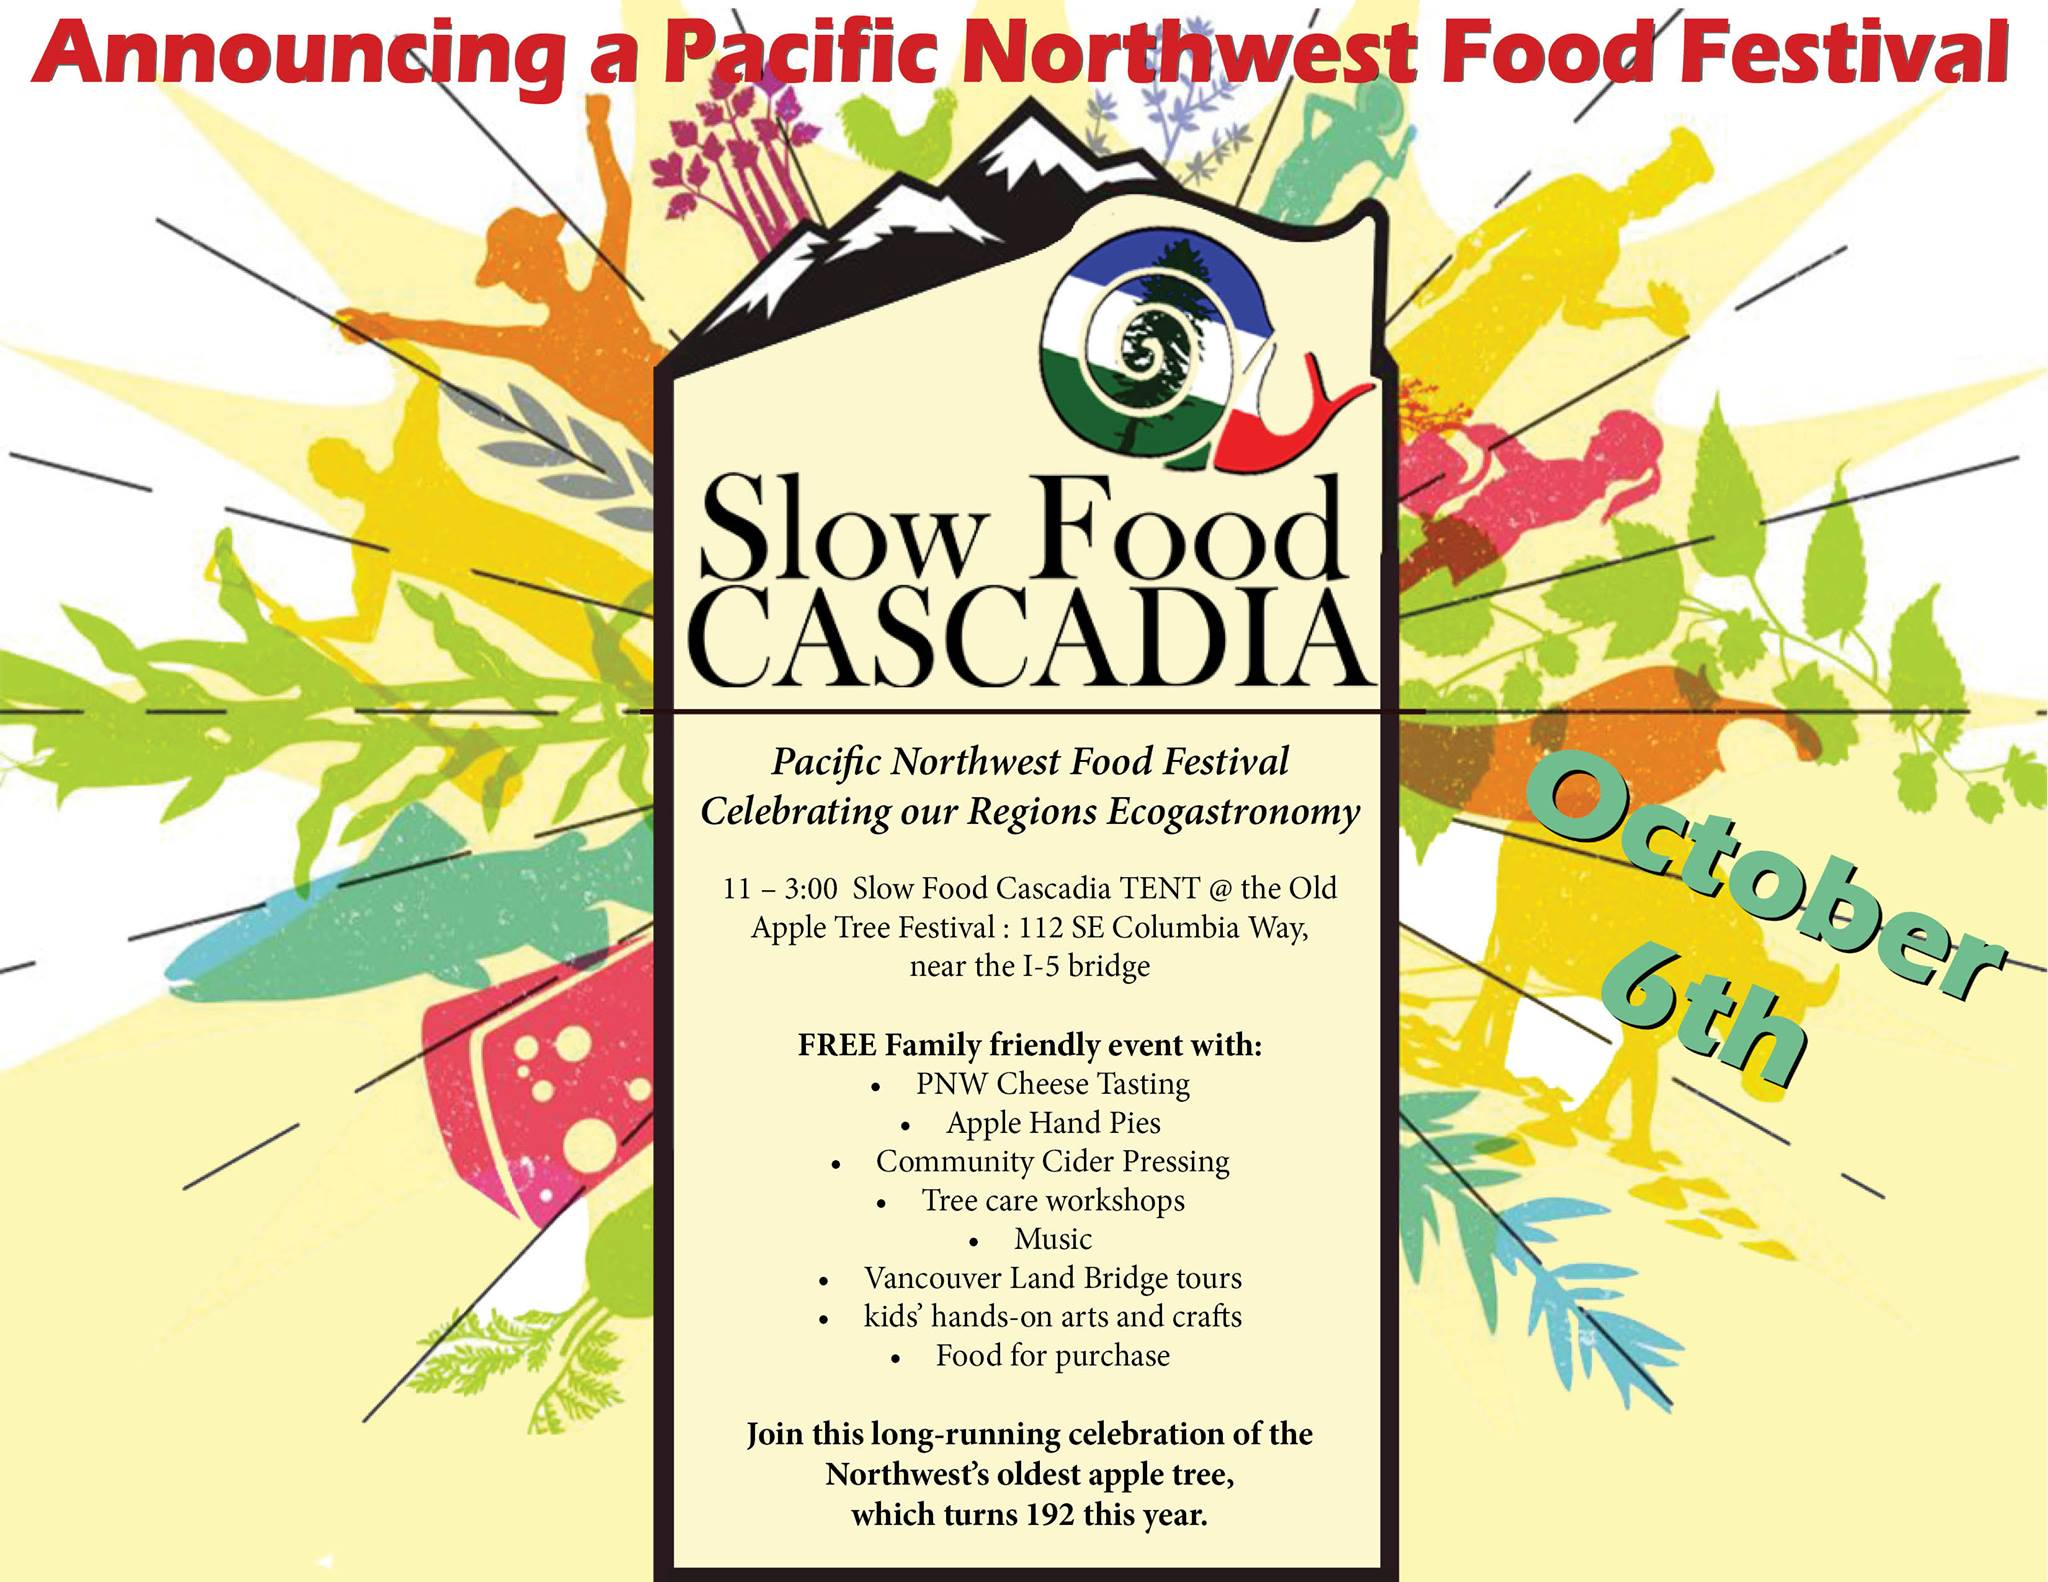 Slow Food Cascadia.jpg